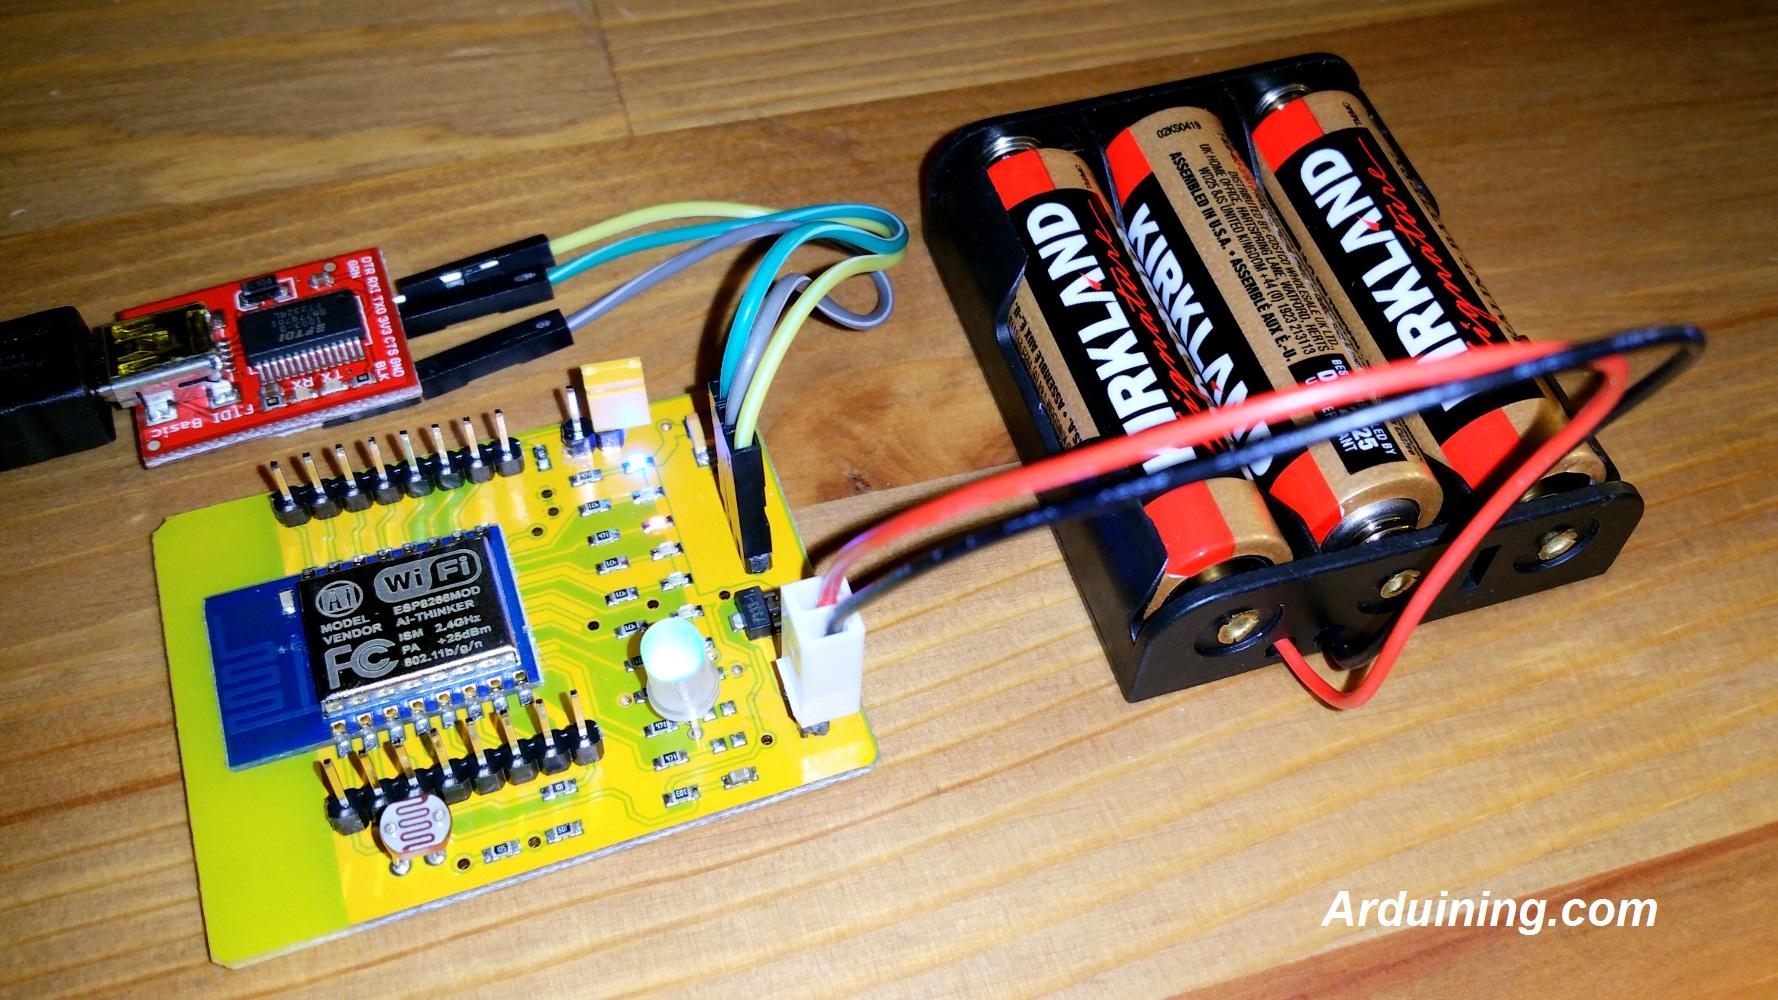 Battery Life of an ESP8266 design – Arduining